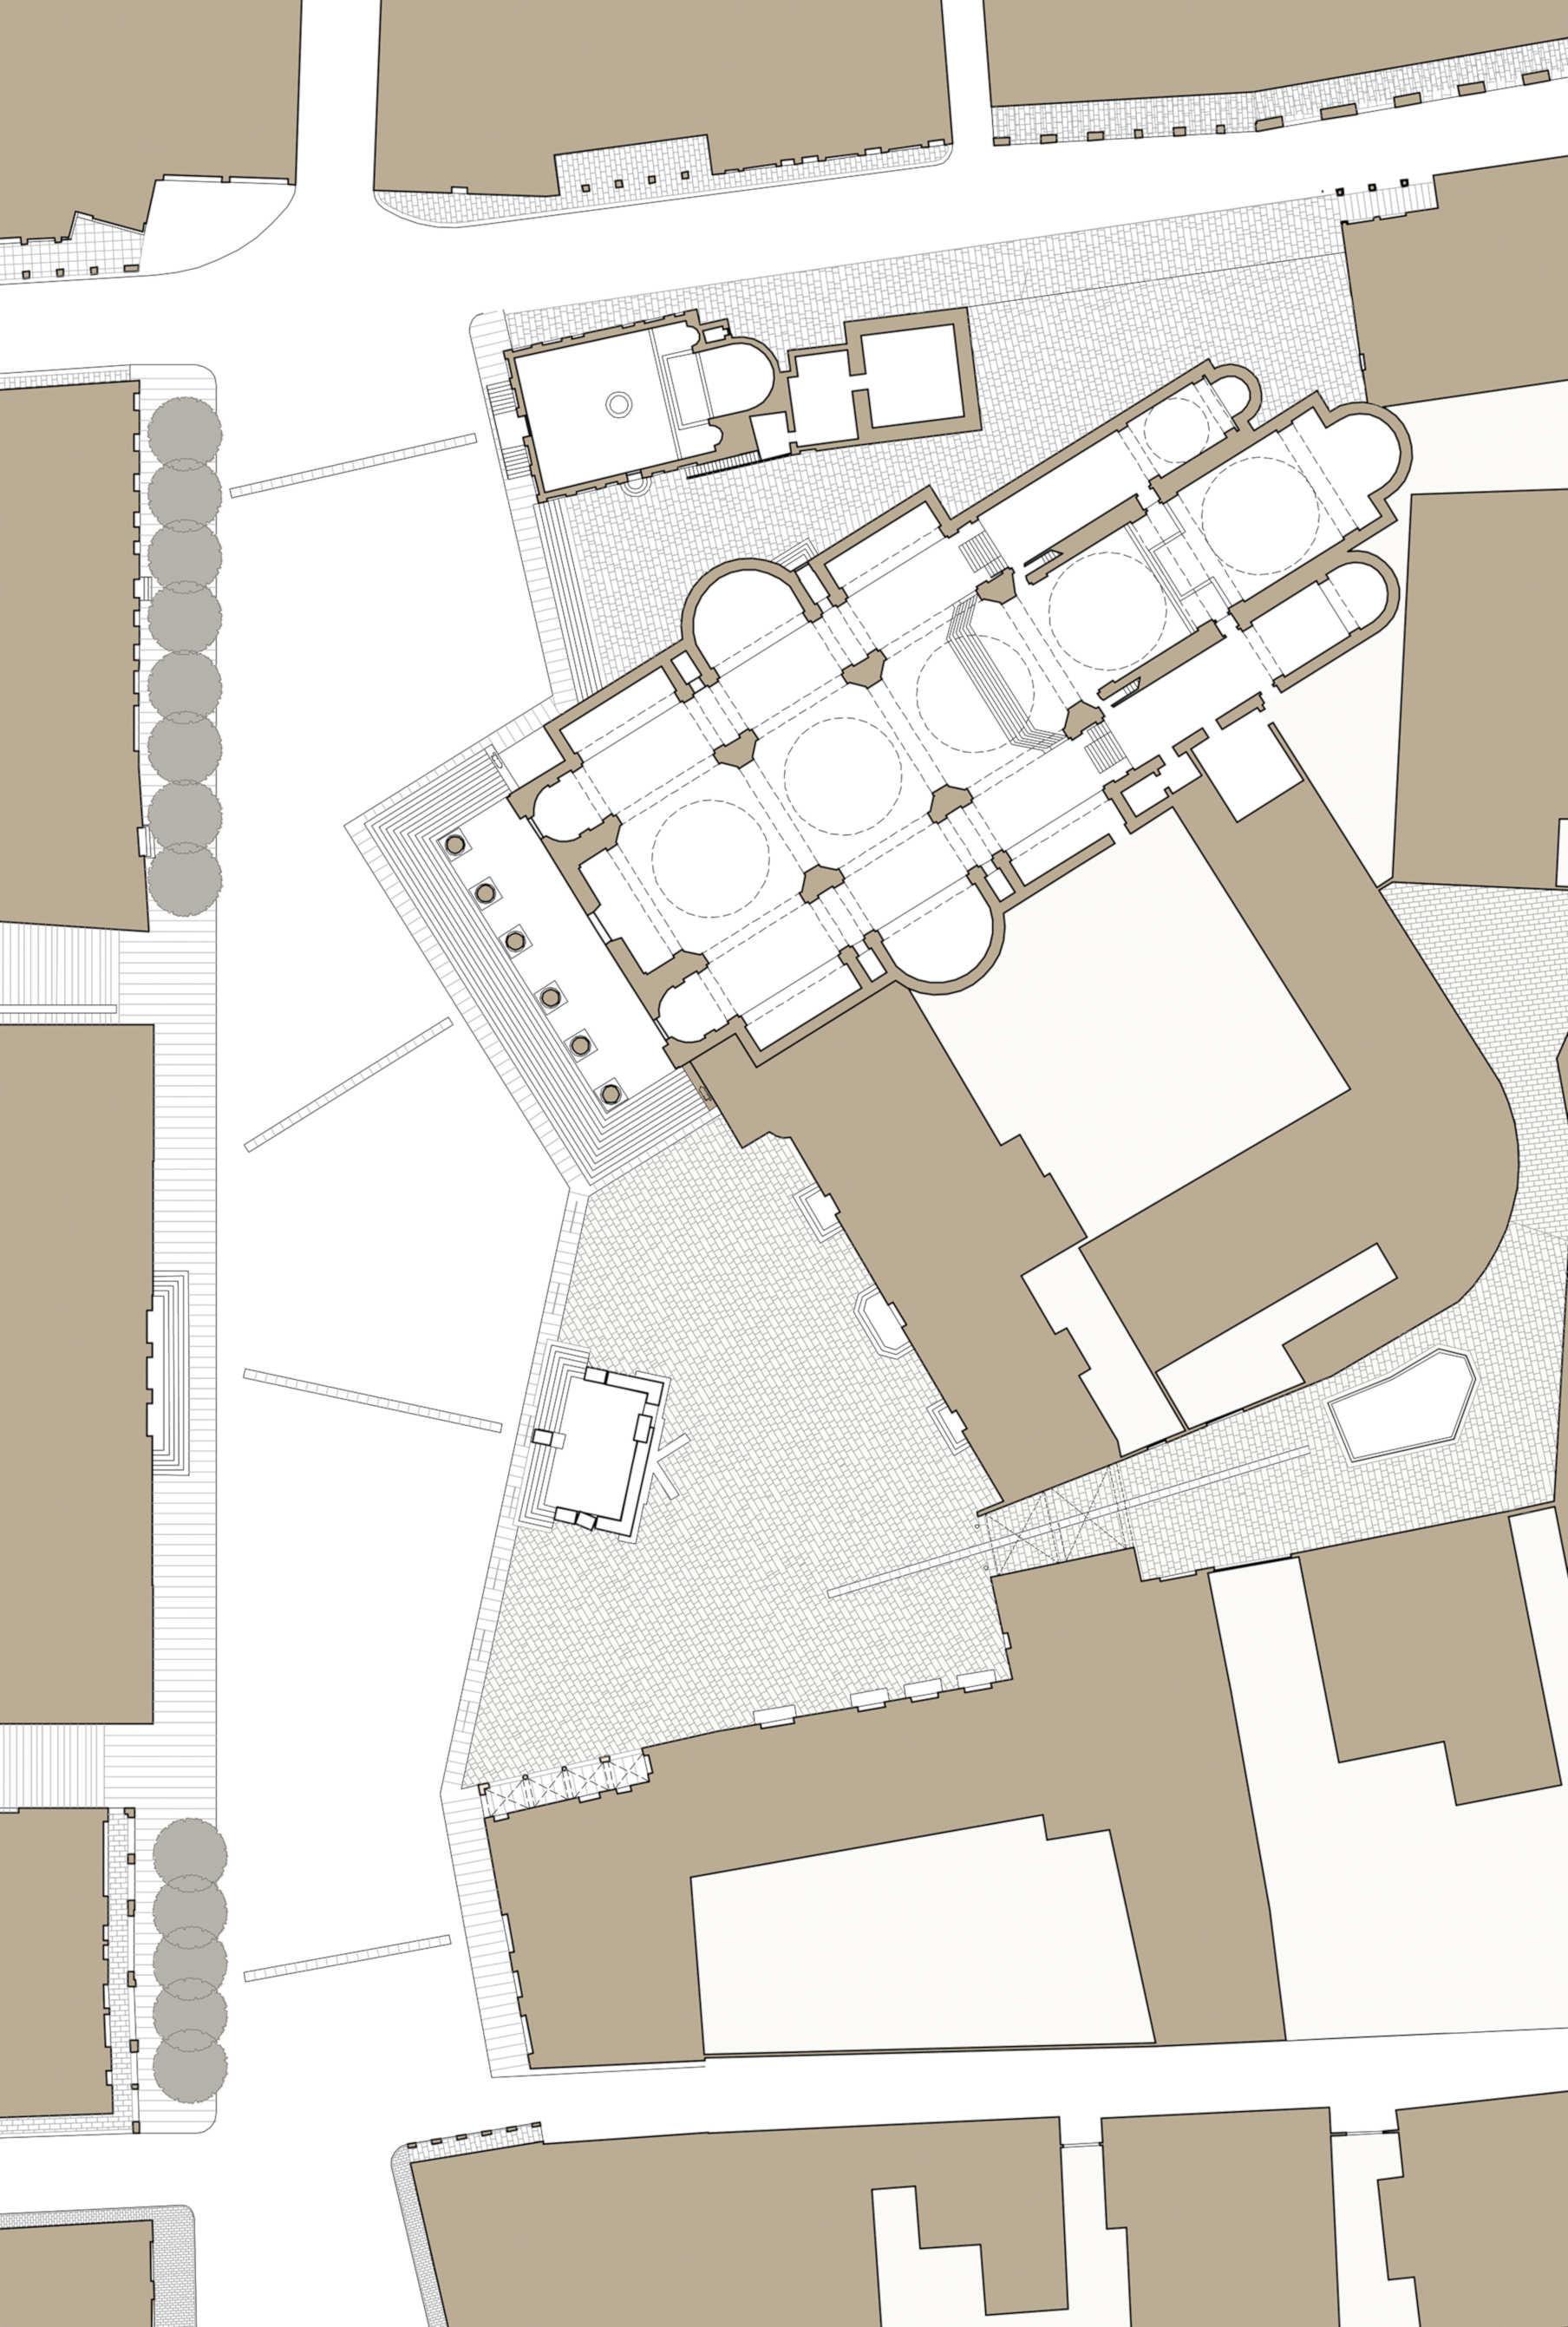 Planimetria d'insieme piazza Duomo Treviso